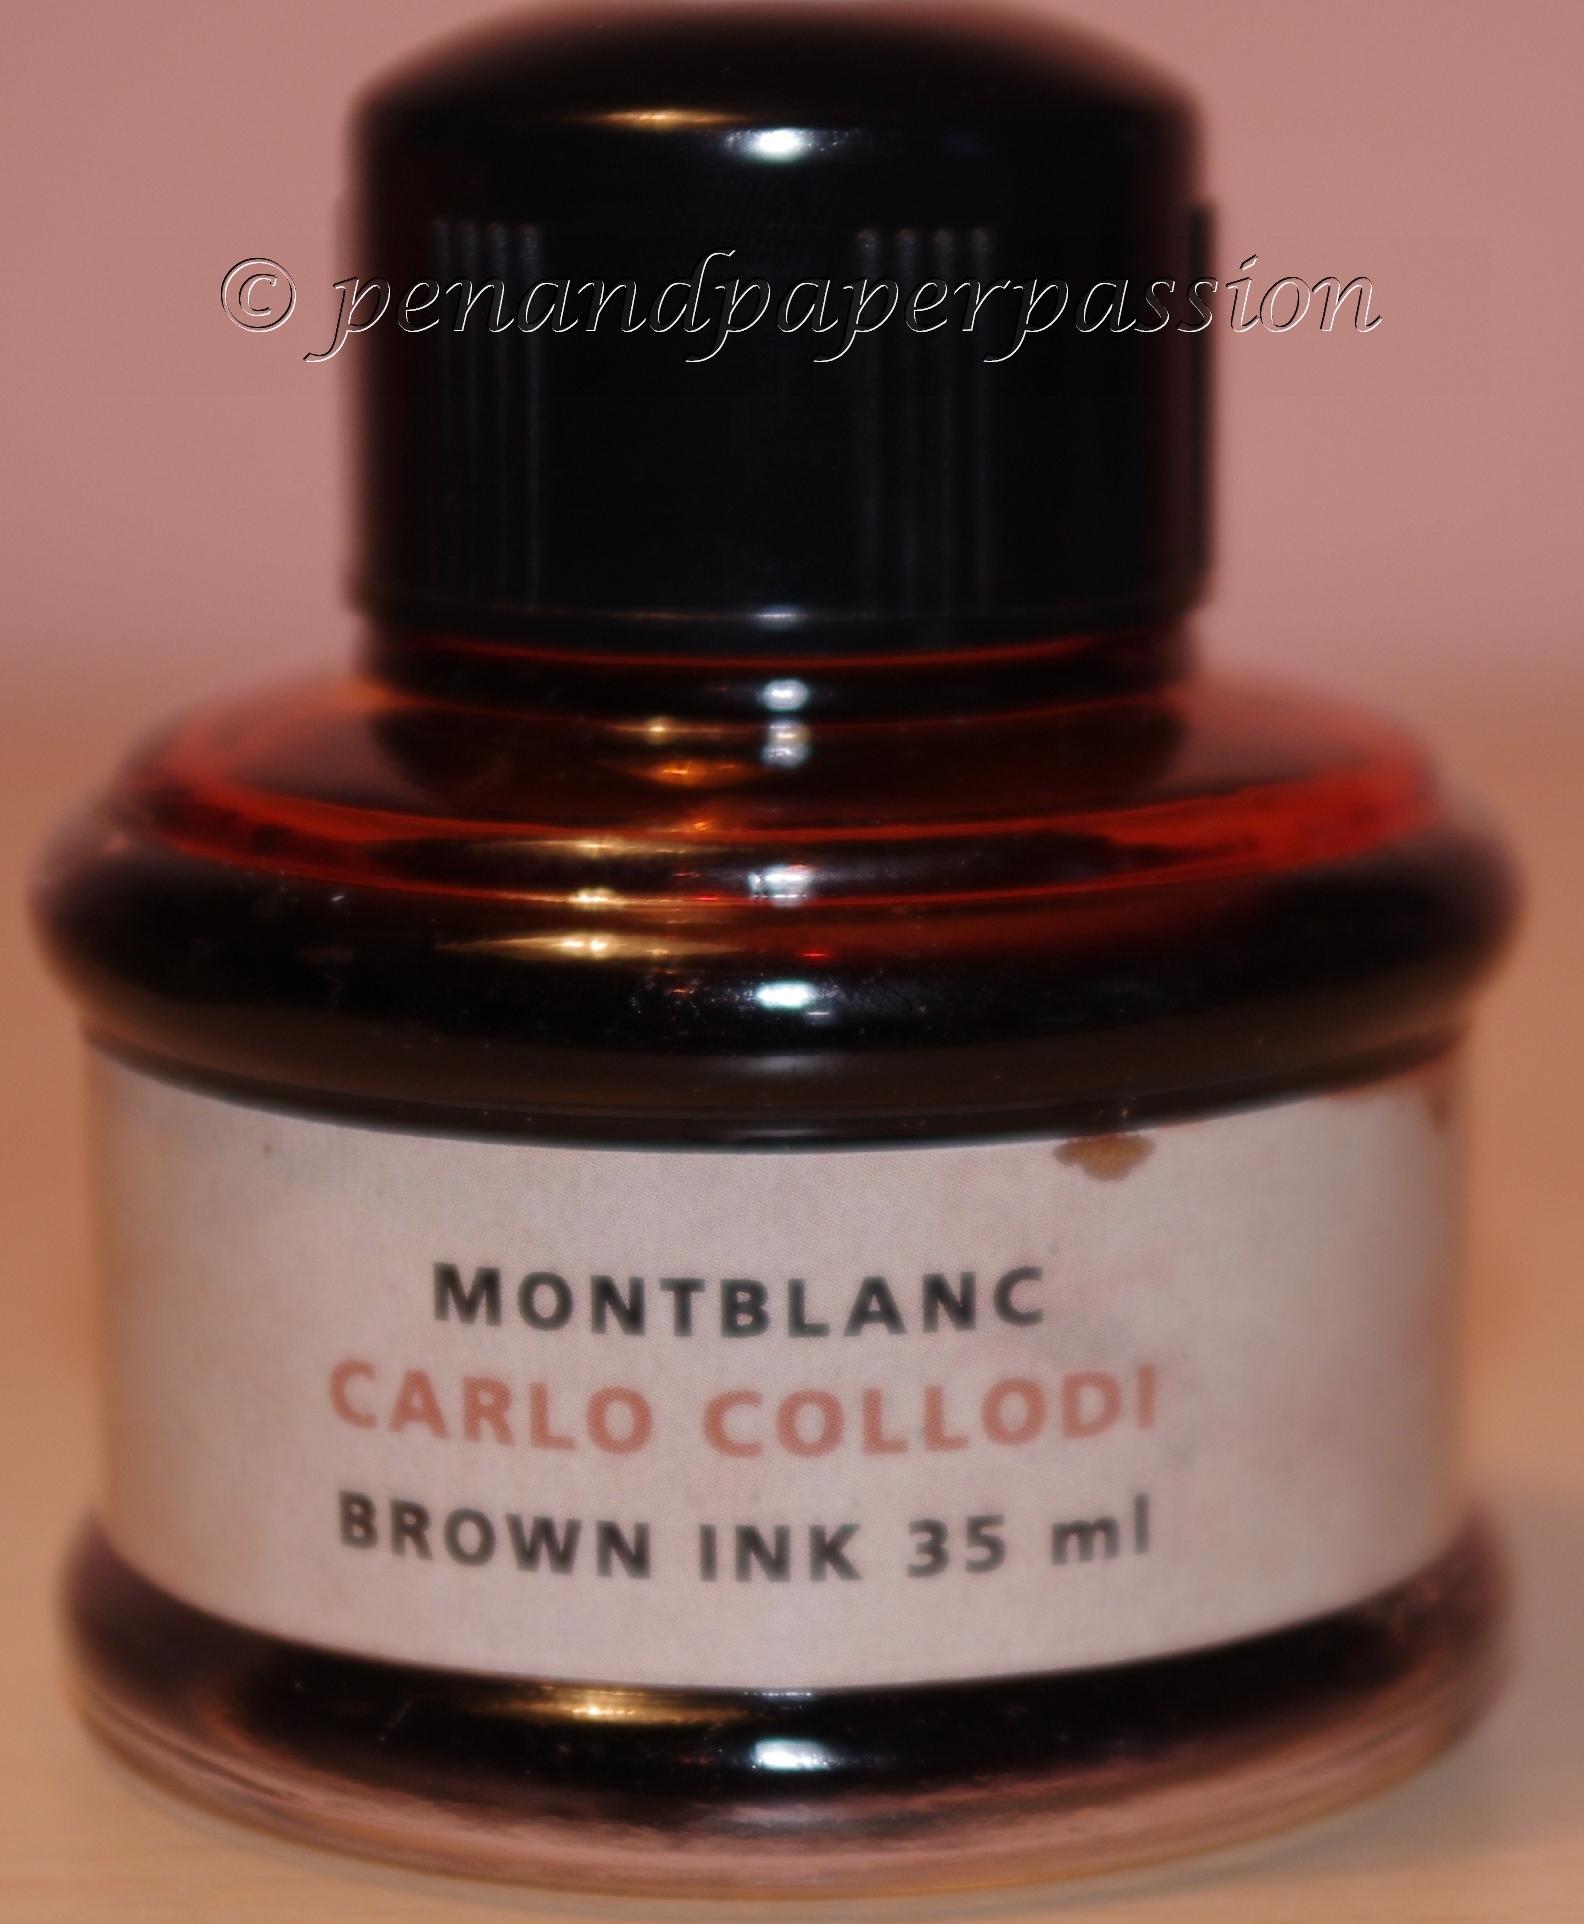 Motblanc Carlo Collodi Fass 1